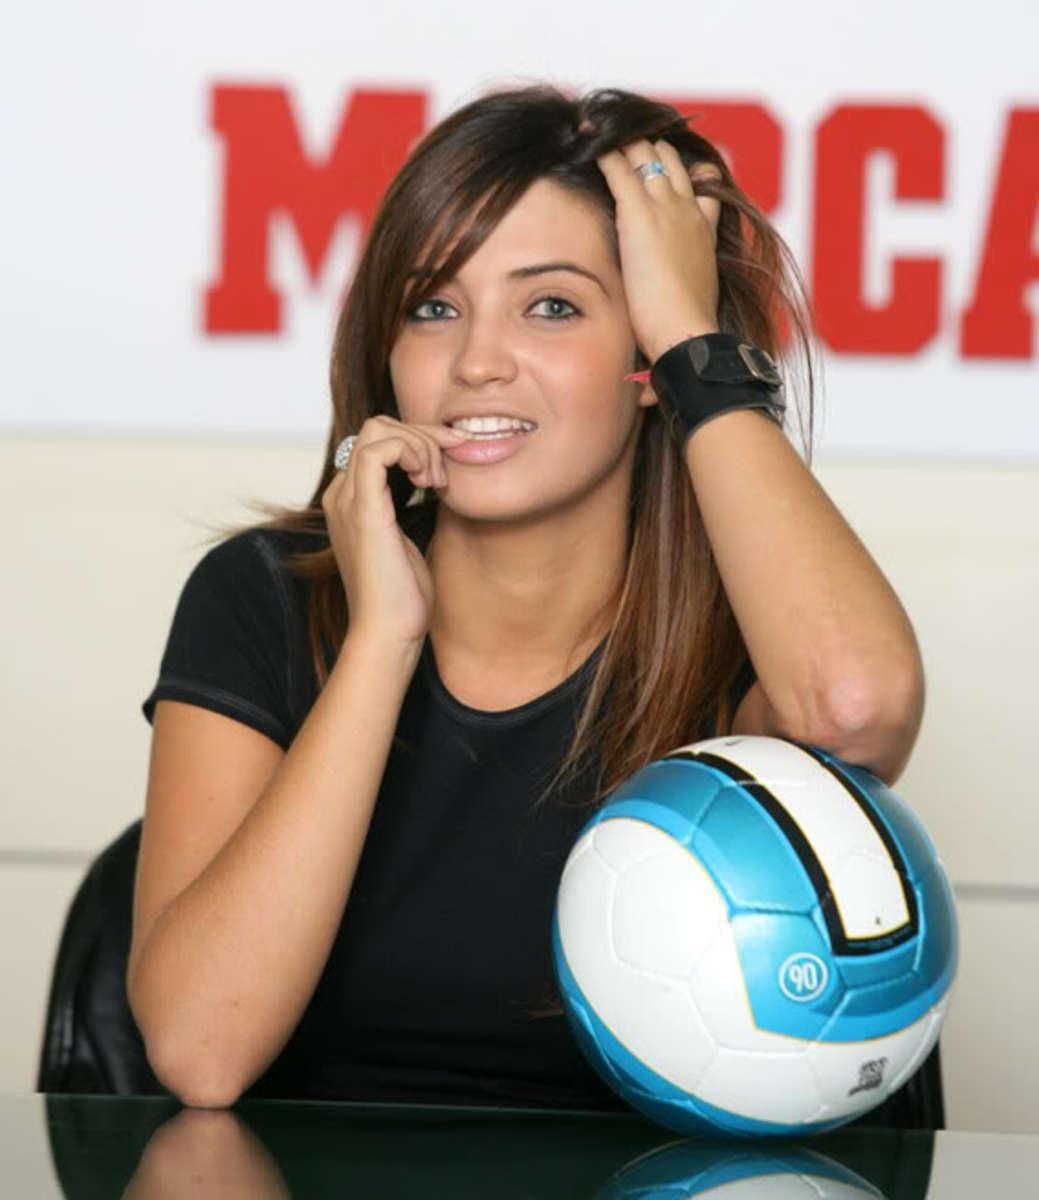 Hot Female Sports Presenters - UK v Rest of The World